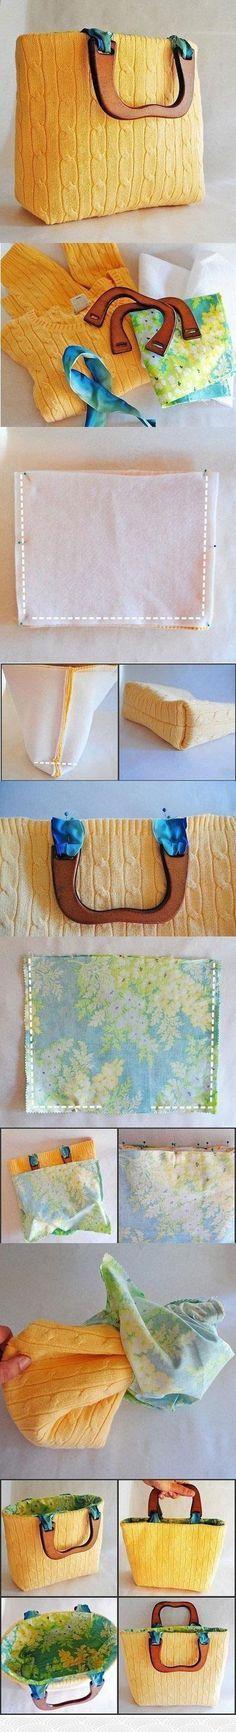 DIY Hand Bag hand bag diy crafts home made easy crafts craft idea crafts ideas diy ideas diy crafts diy idea do it yourself diy projects diy craft handmade diy purse